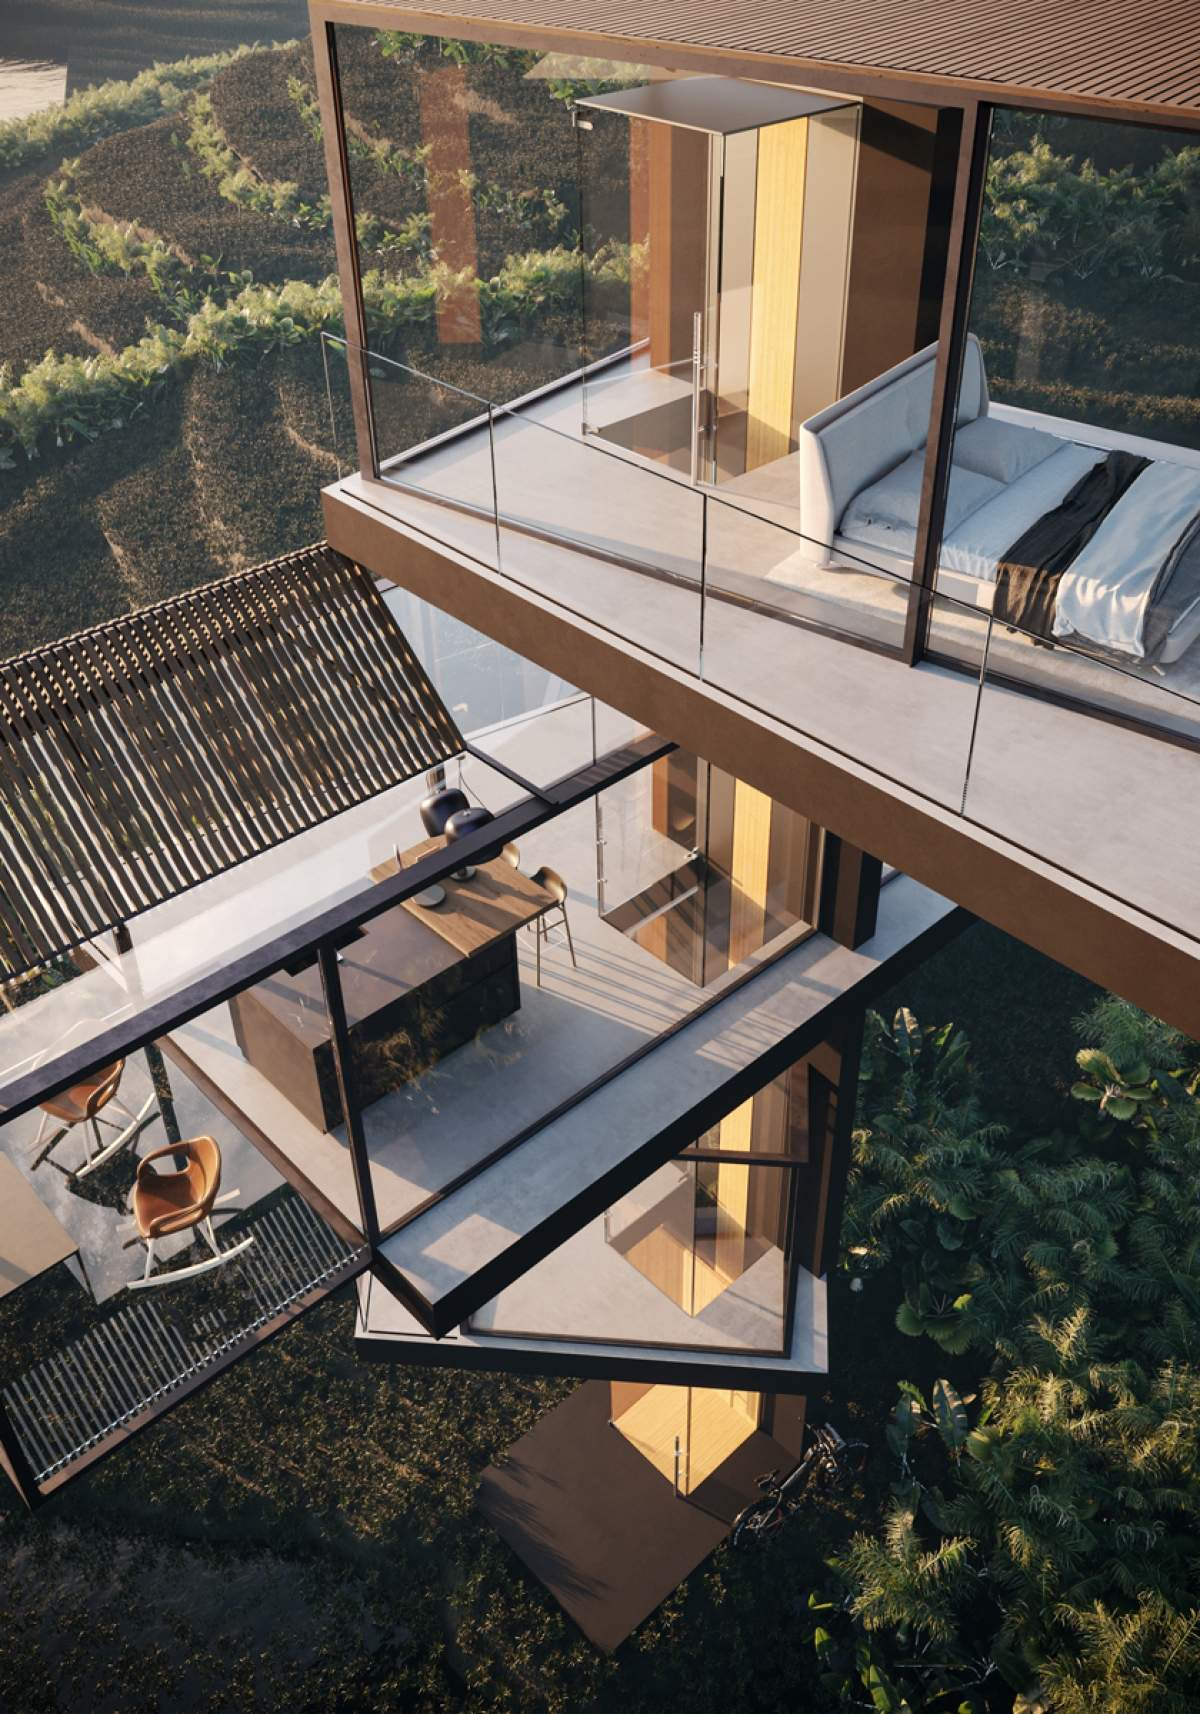 Xianggong, Casa sulla risaia, Cina - project by Adriano Design